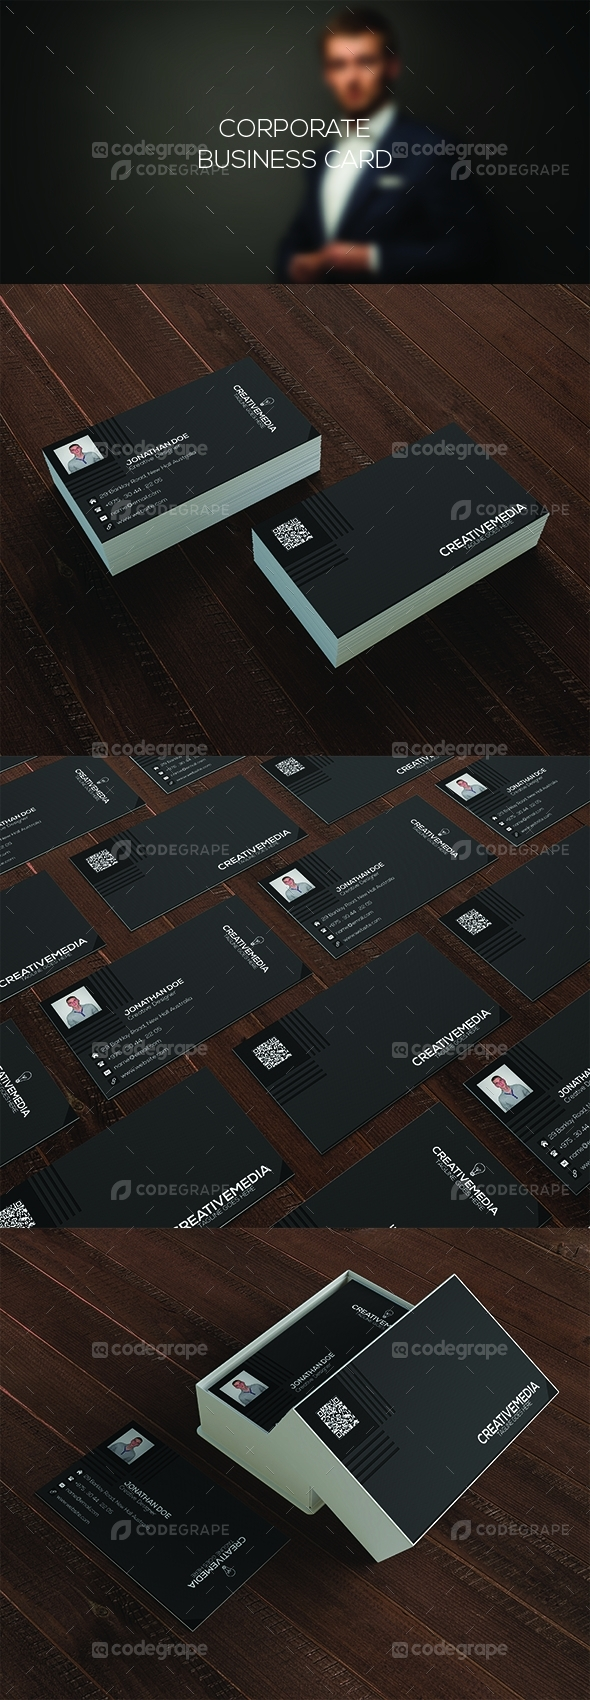 Corporate Business Card 2